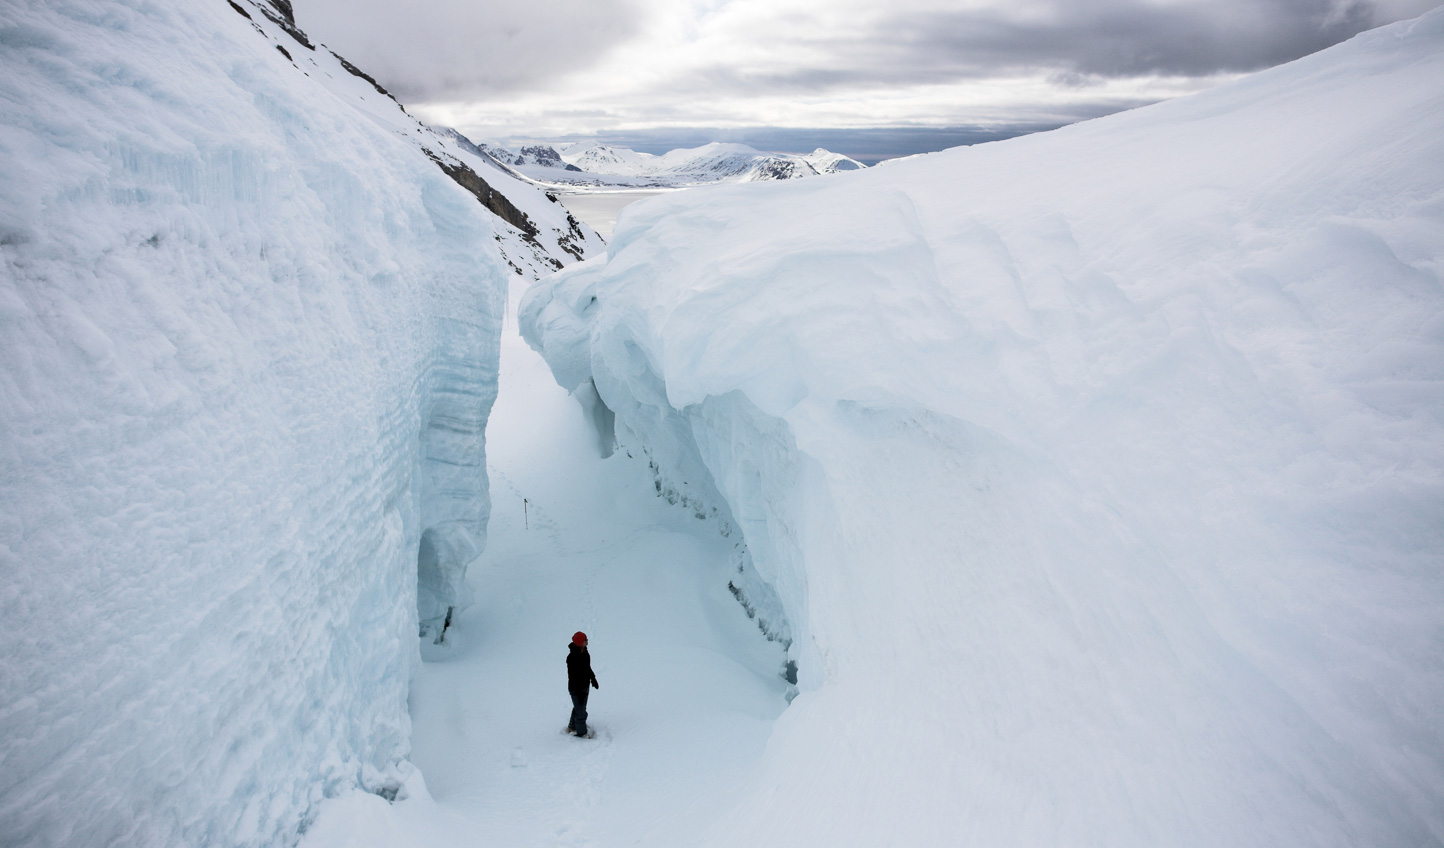 Venture into deep crevasses